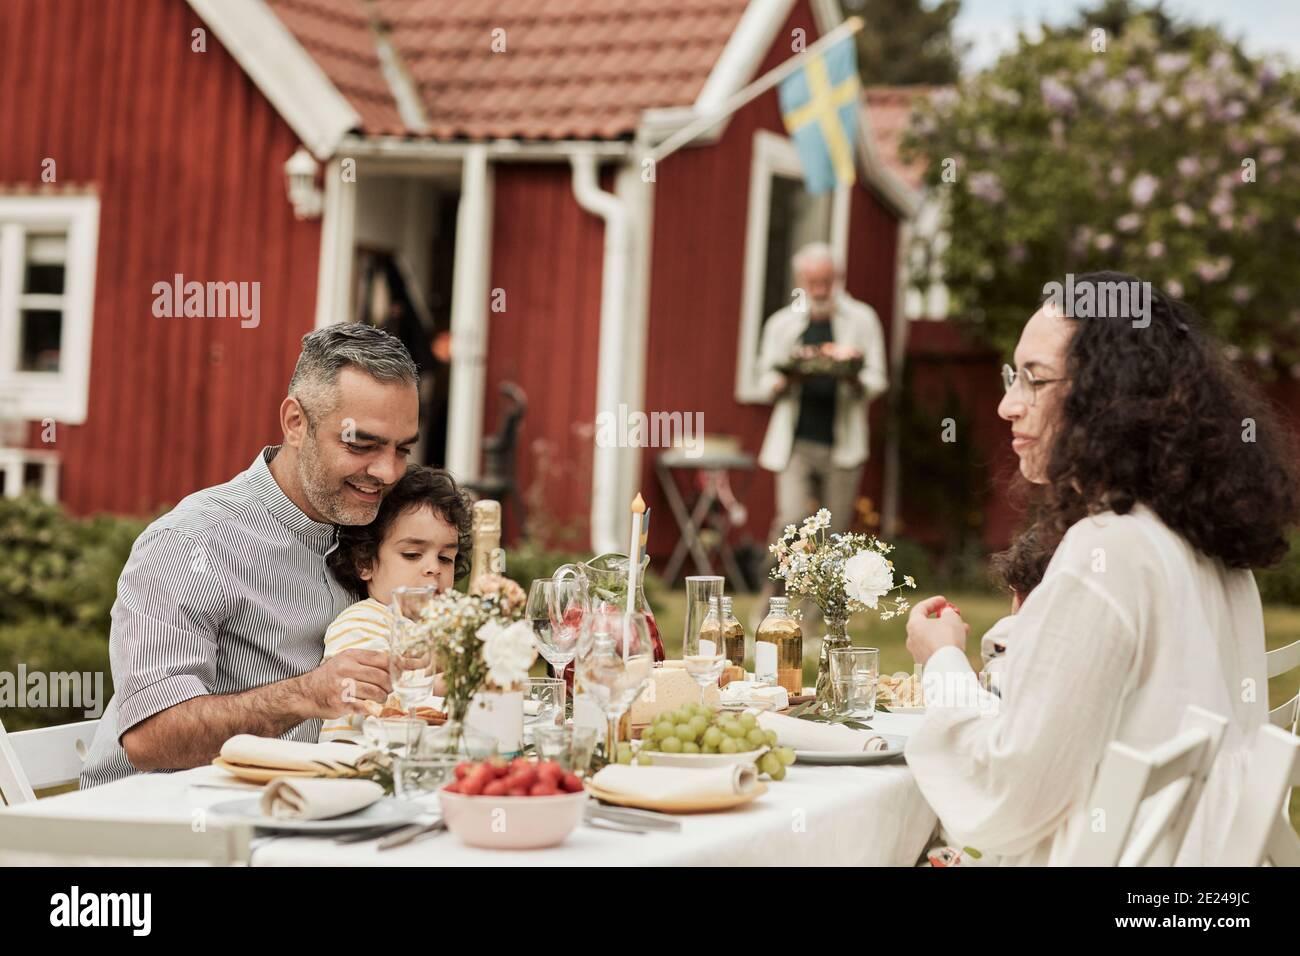 Family having meal in garden Stock Photo